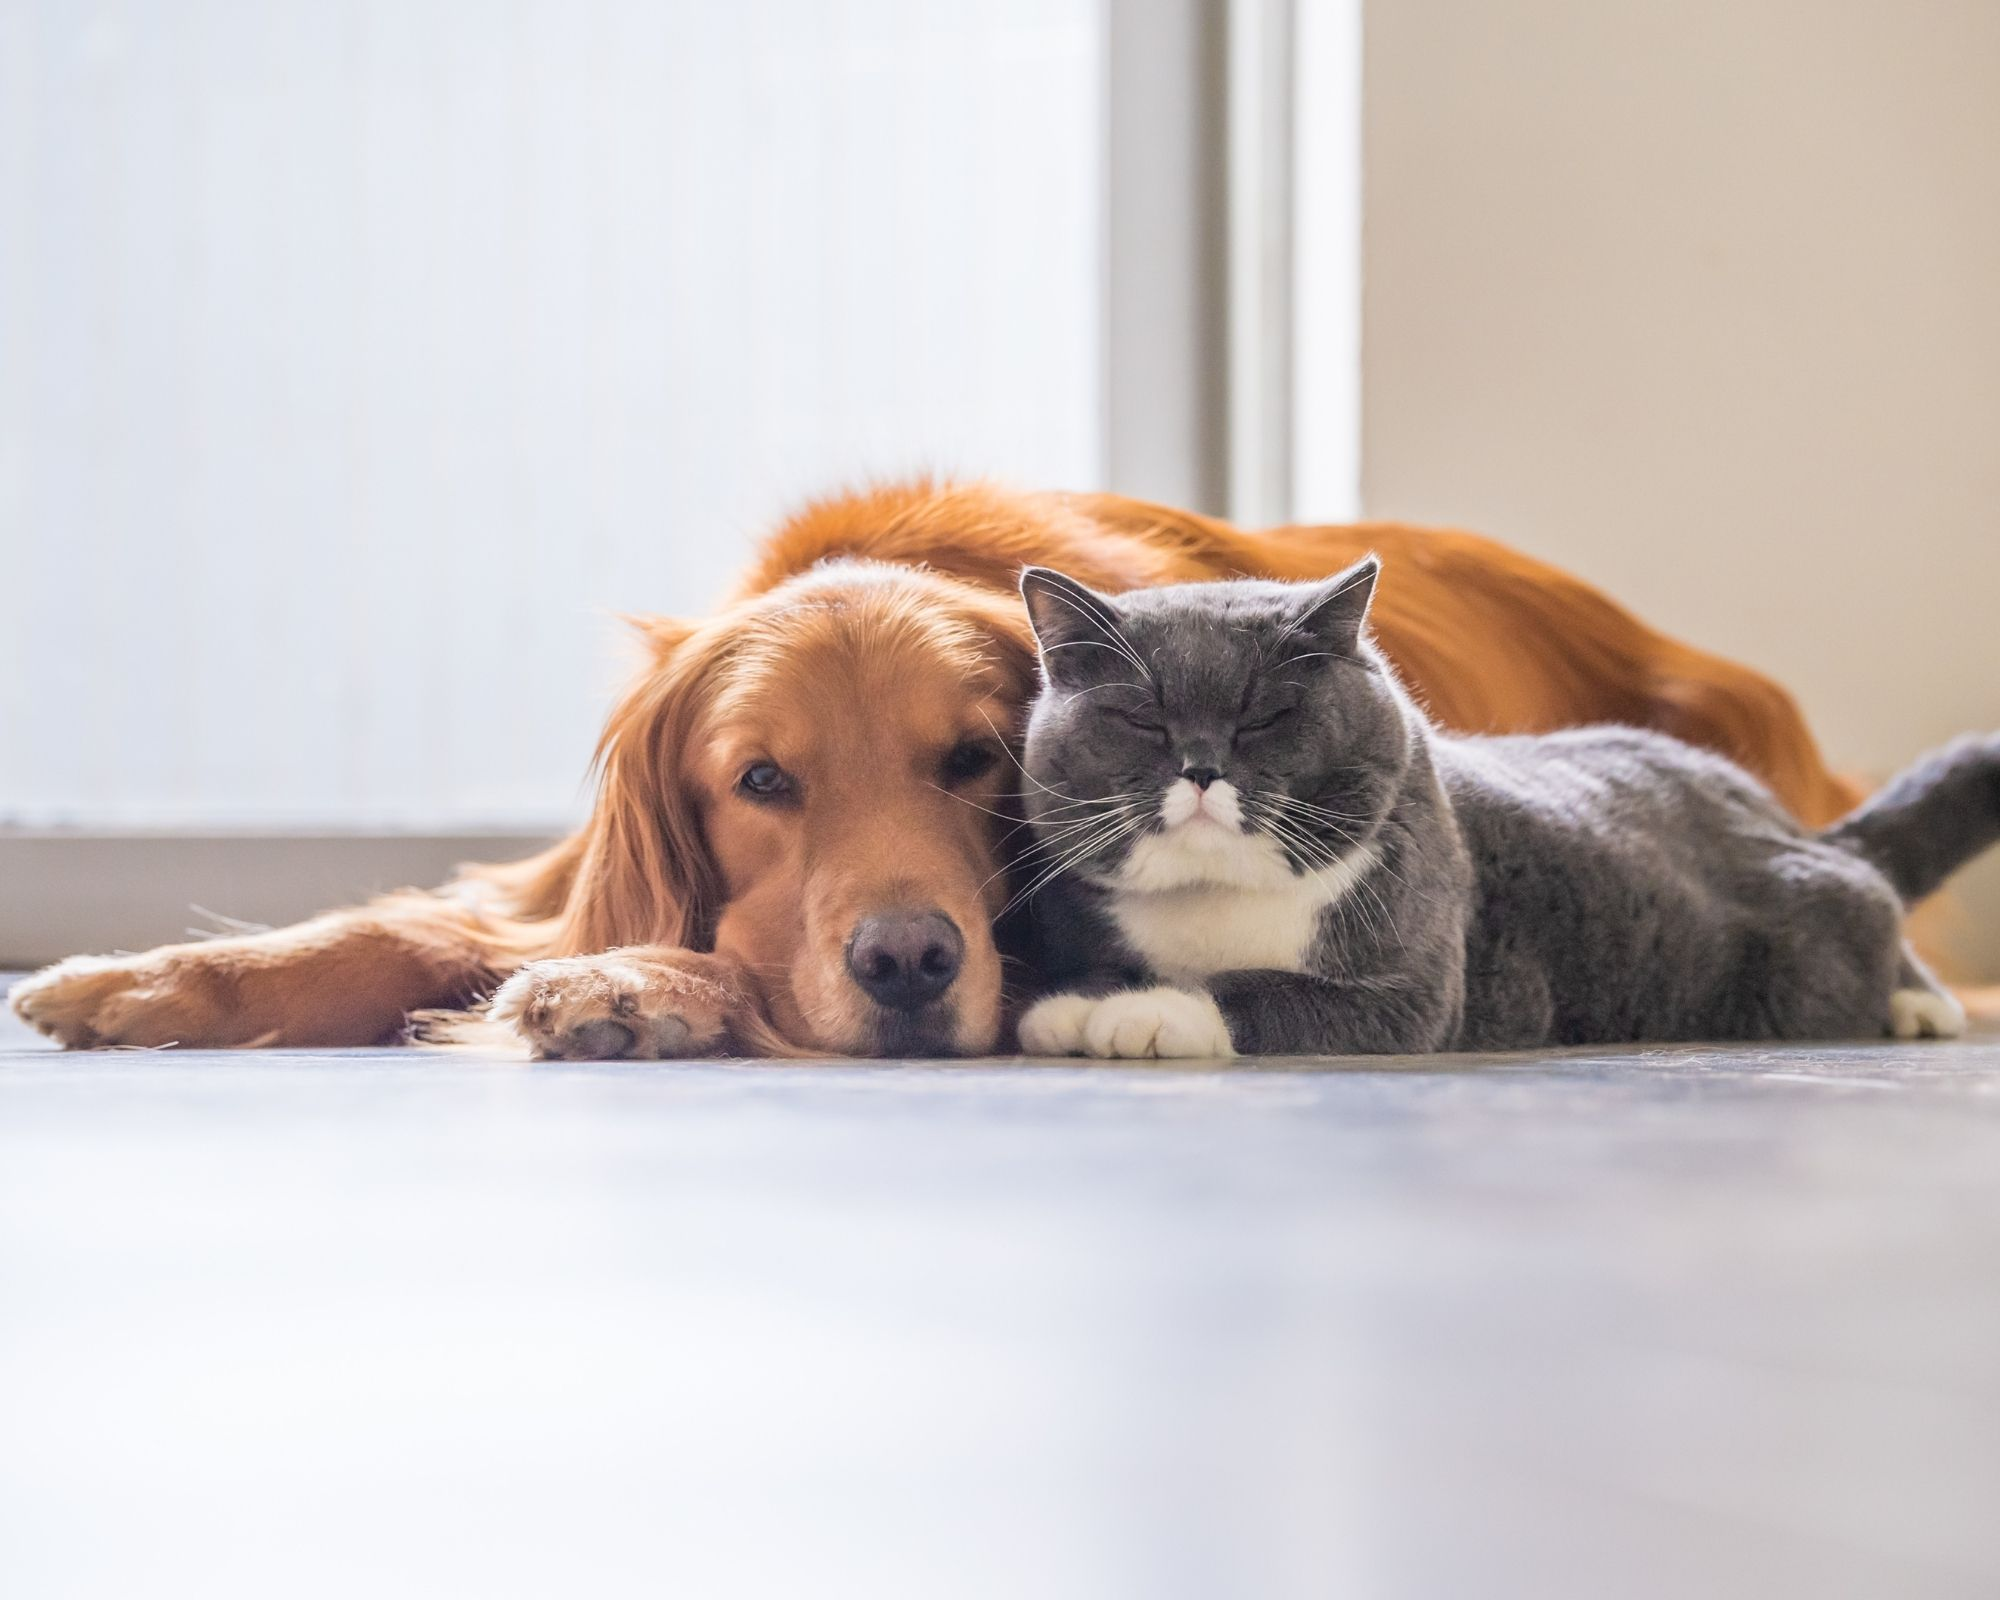 USPCA's Pet Pledge